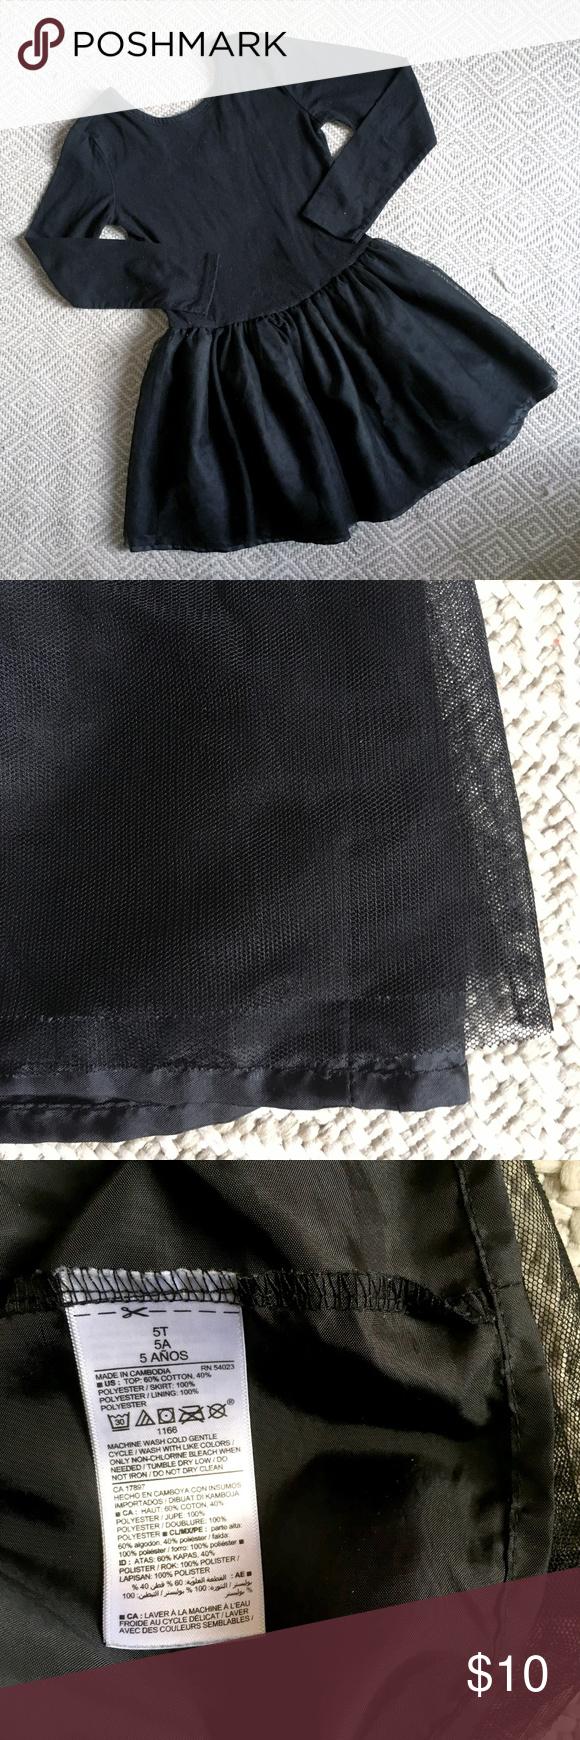 Old Navy Black Tutu Dress 5t Black Tutu Clothes Design Tutu Dress [ 1740 x 580 Pixel ]